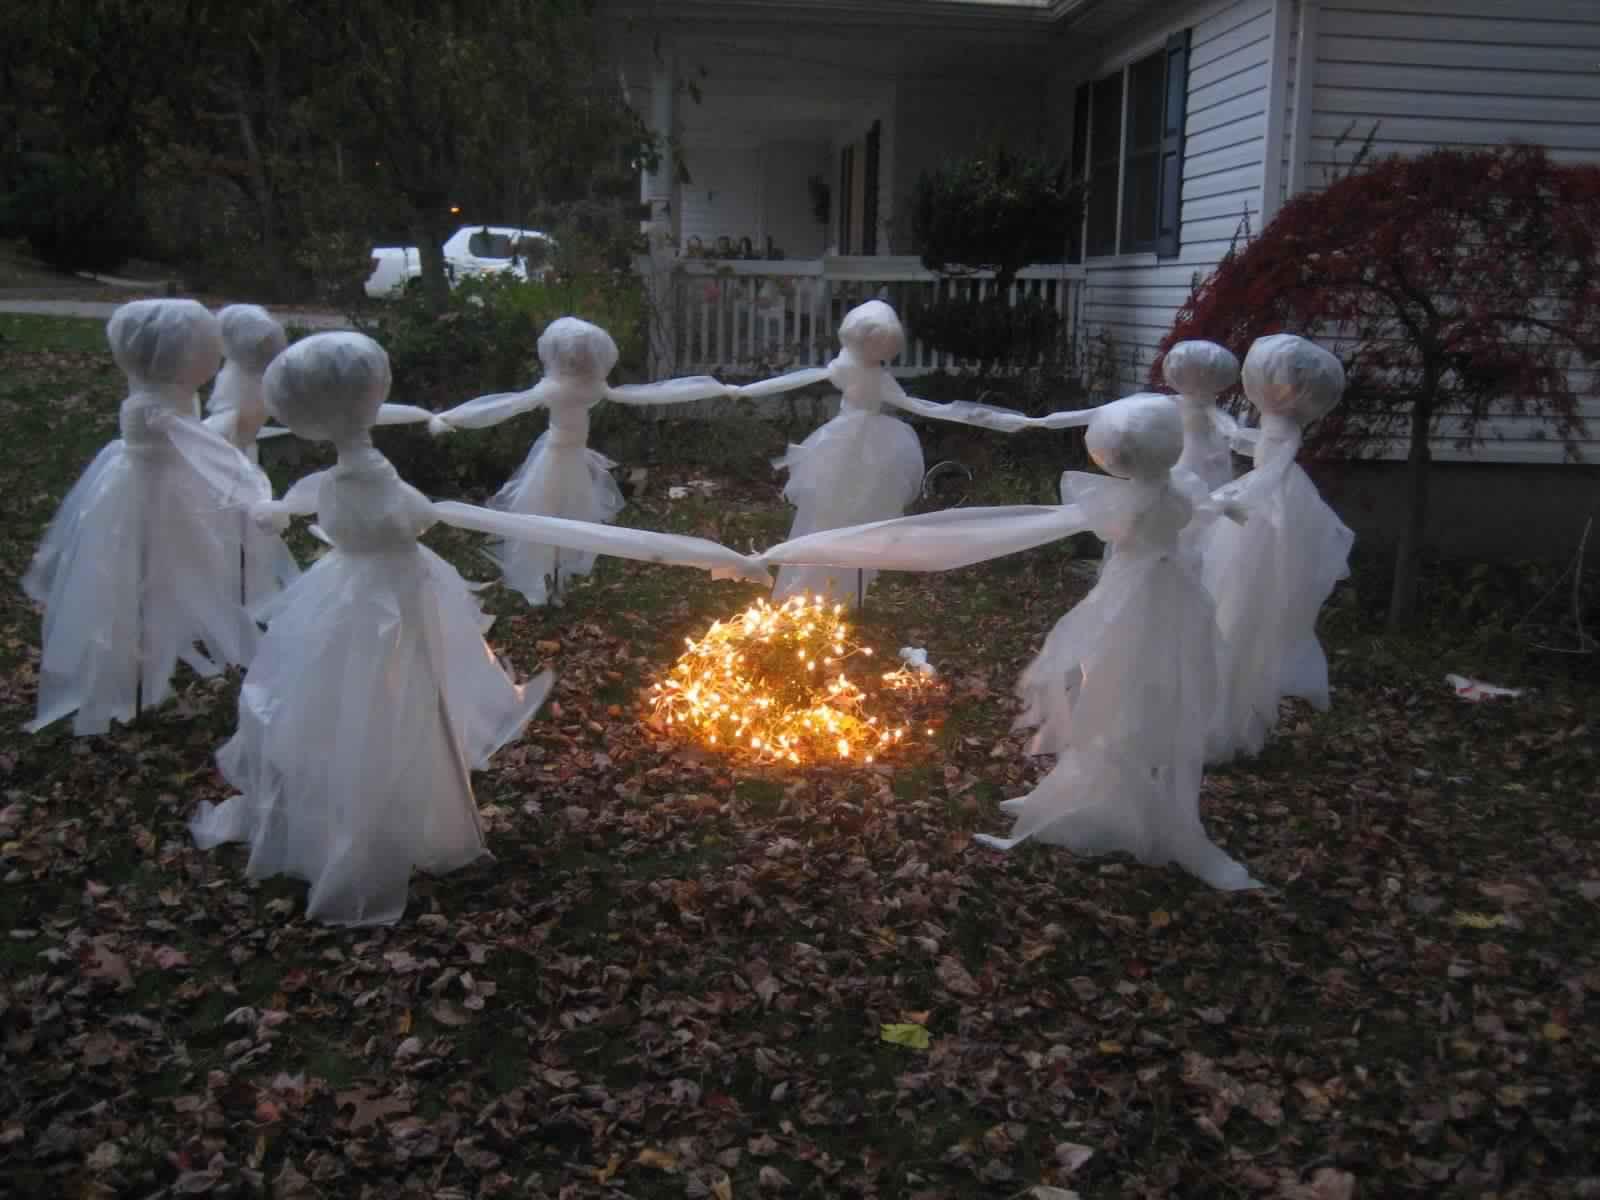 Outdoor Halloween Decorations Spirit forms 2017